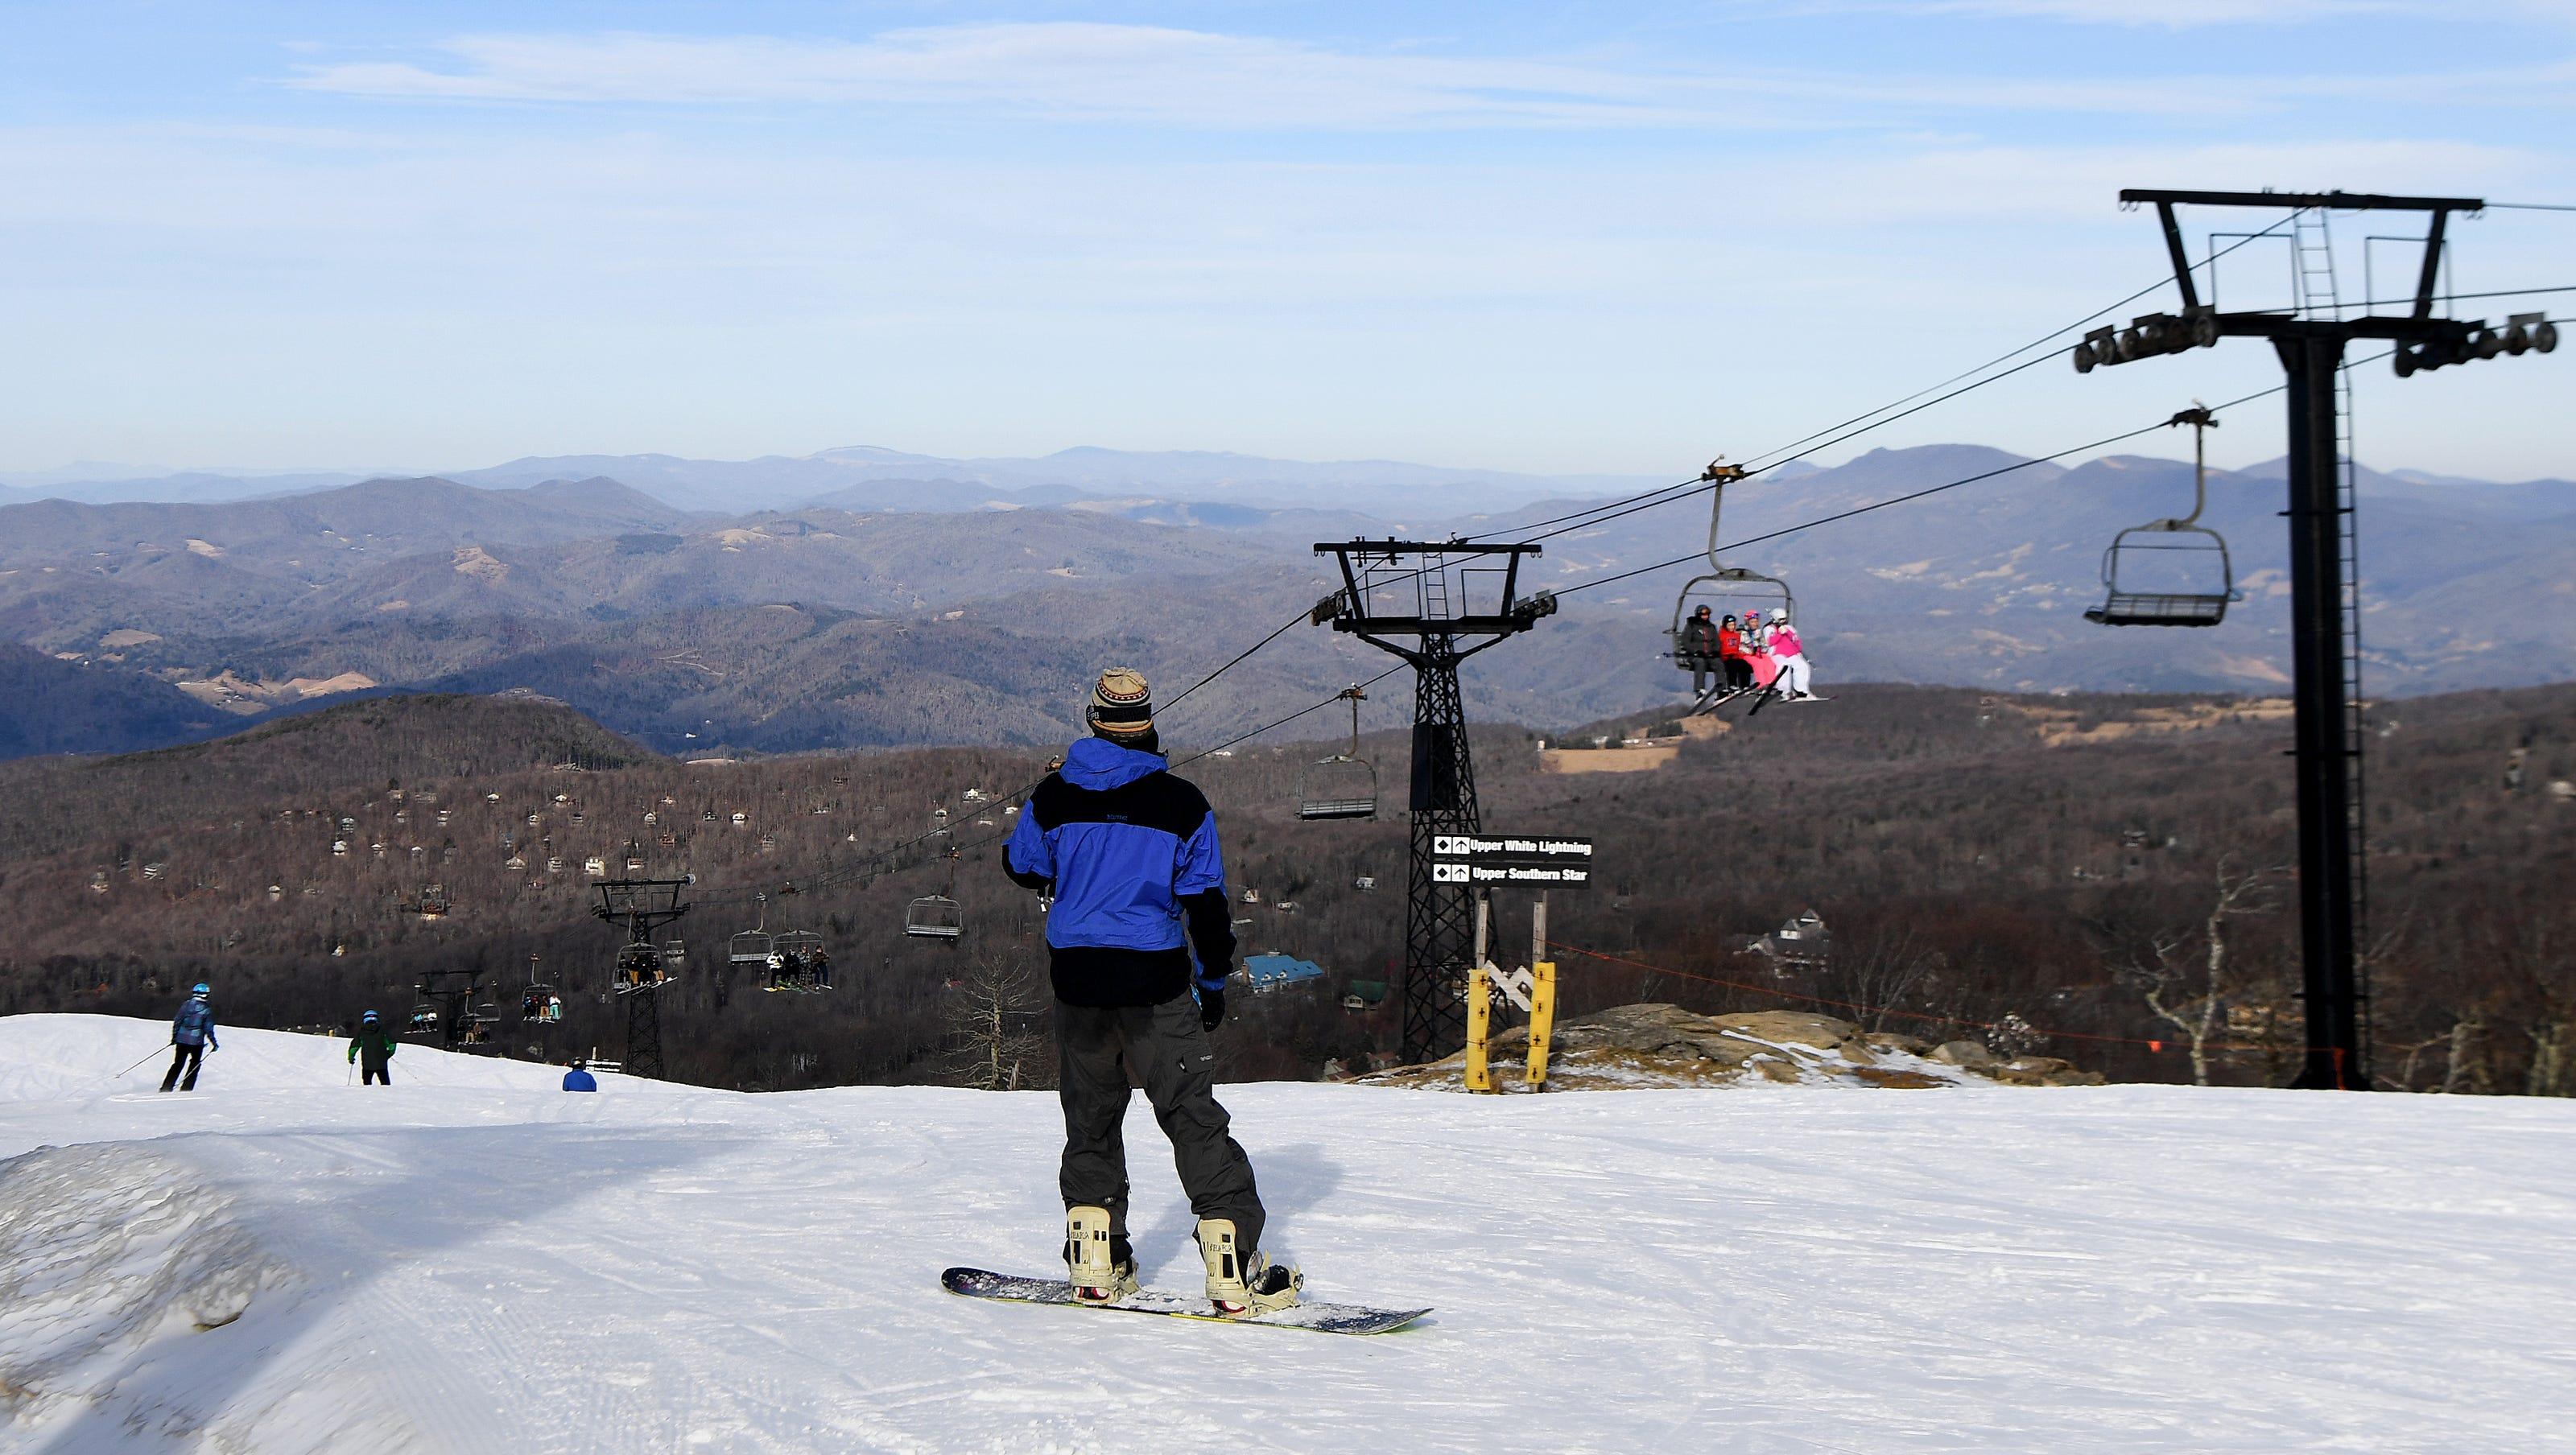 feeling the february heat, wnc ski areas close early for season